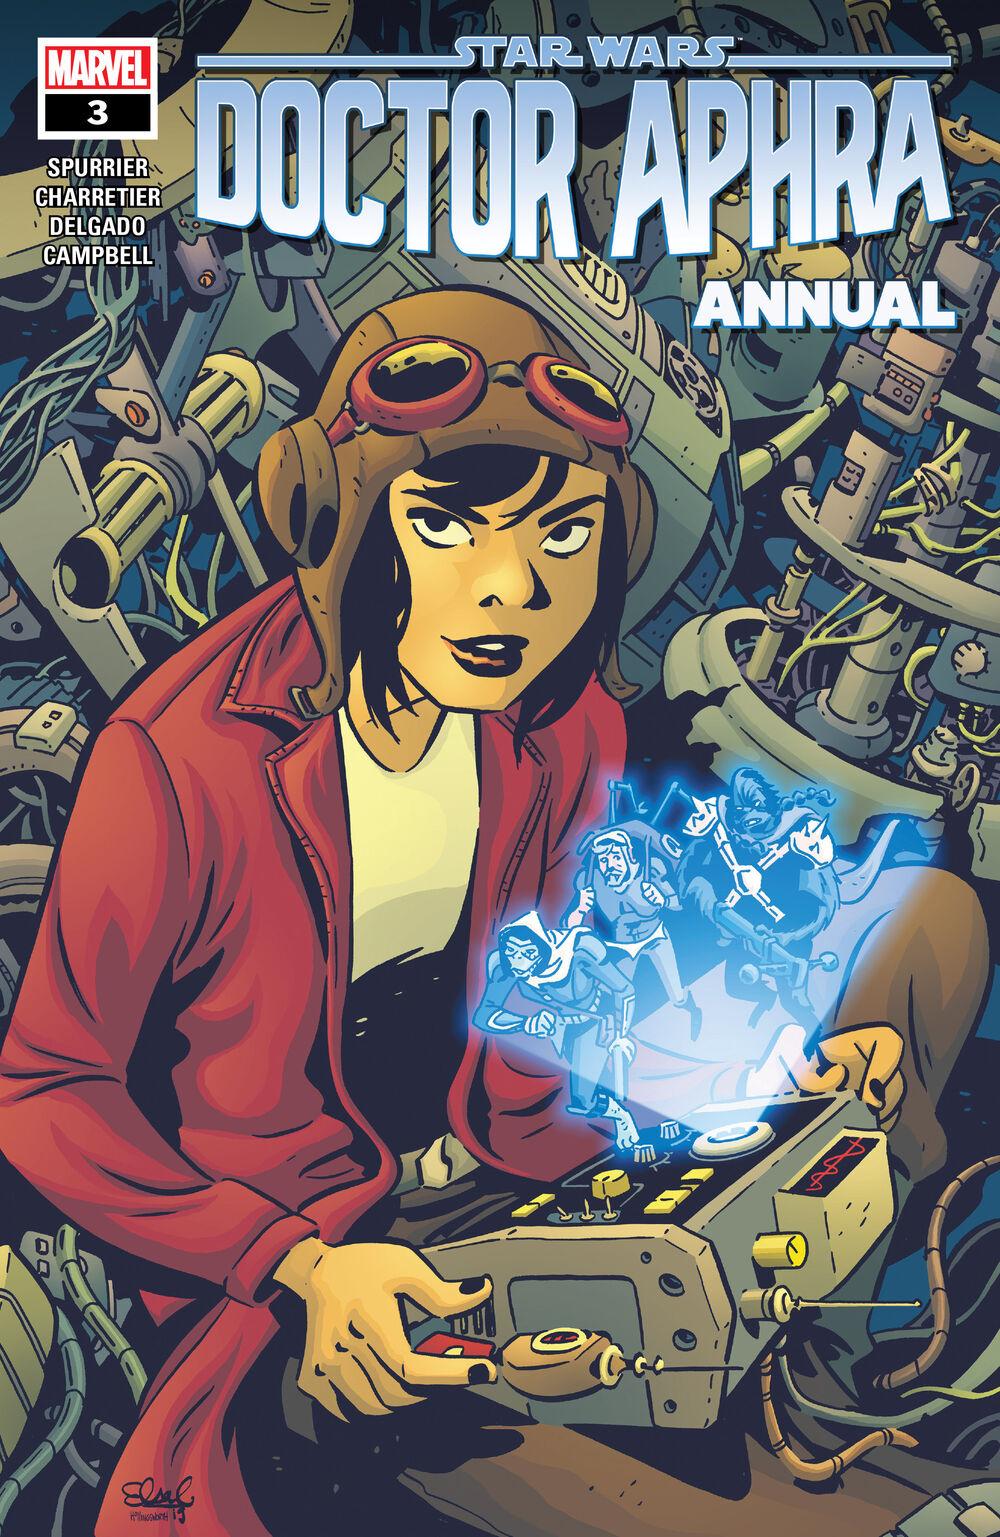 MARVEL - STAR WARS: DOCTOR APHRA ANNUAL Doctor35